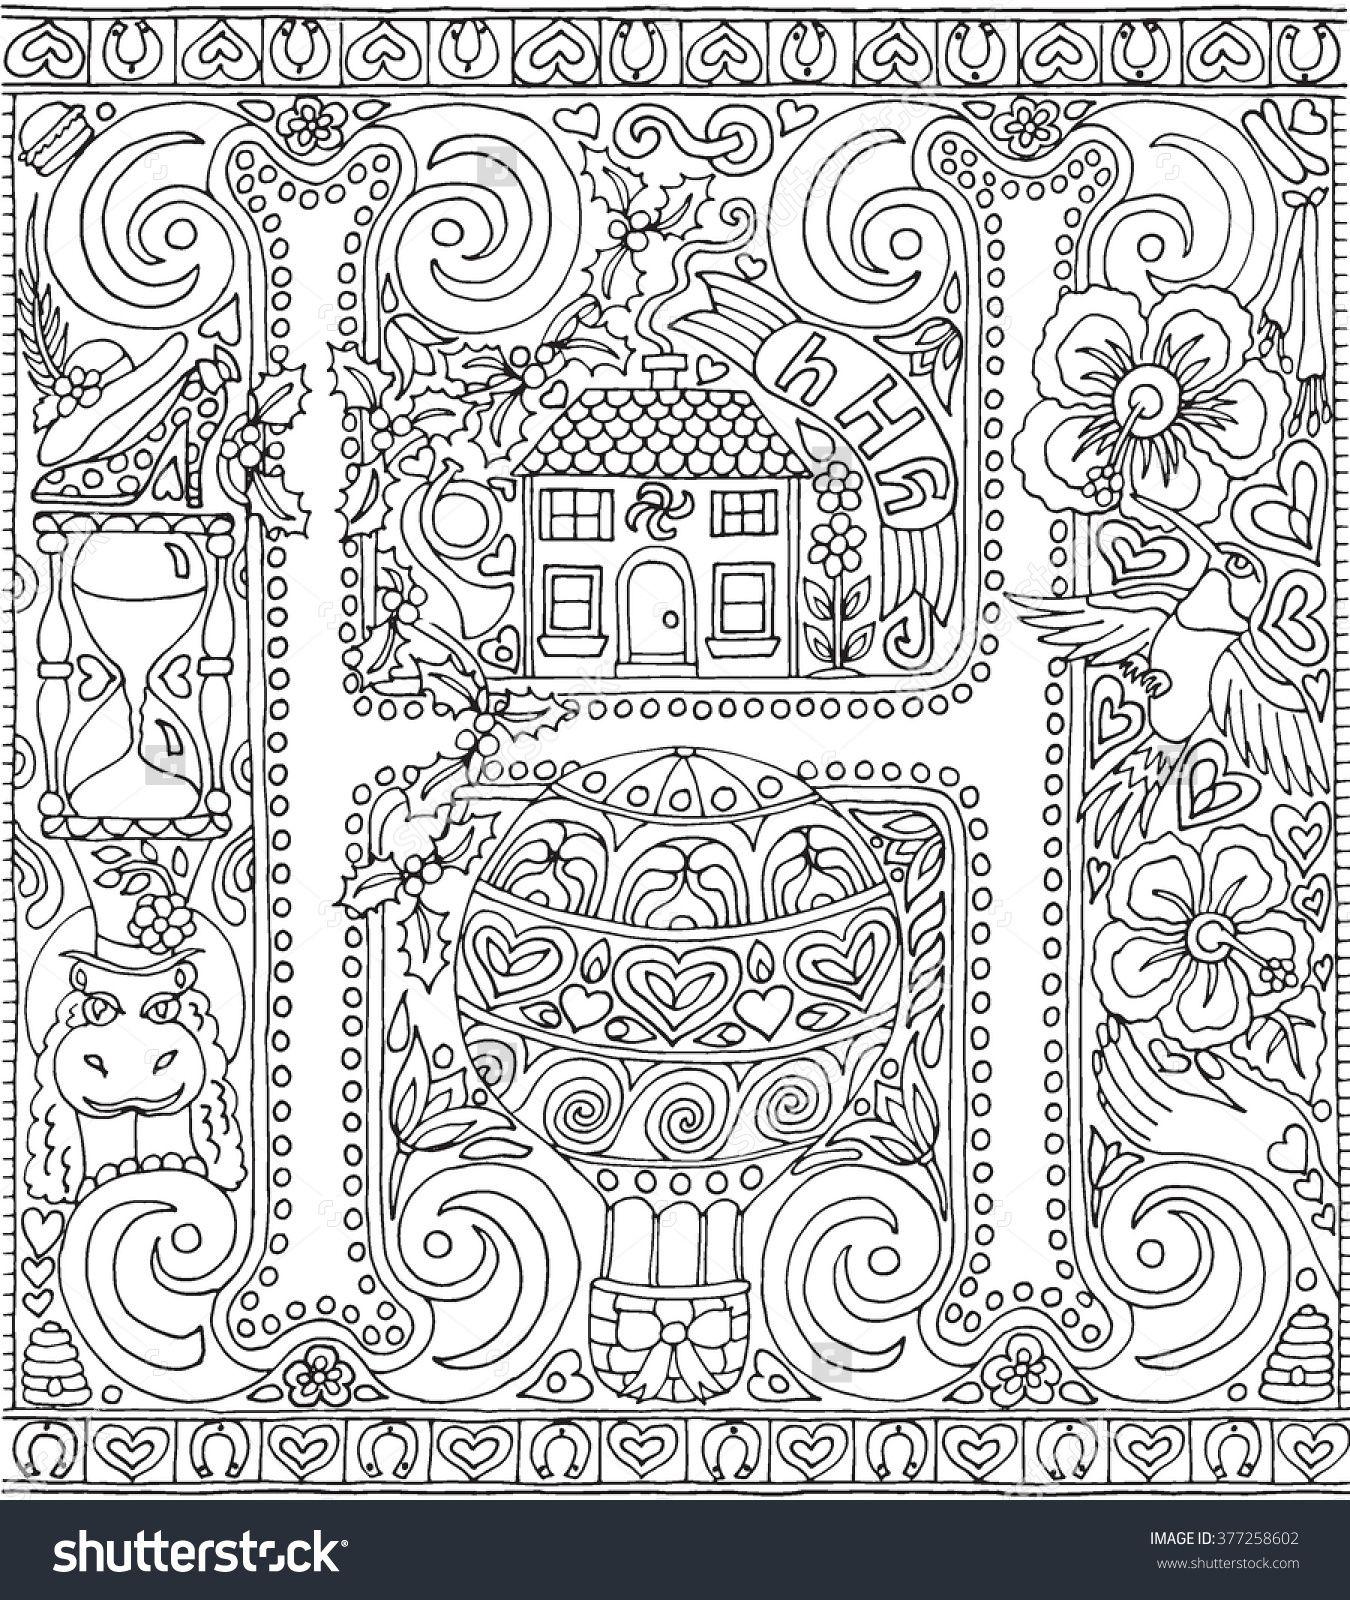 Image Result For Adult Colouring Zen